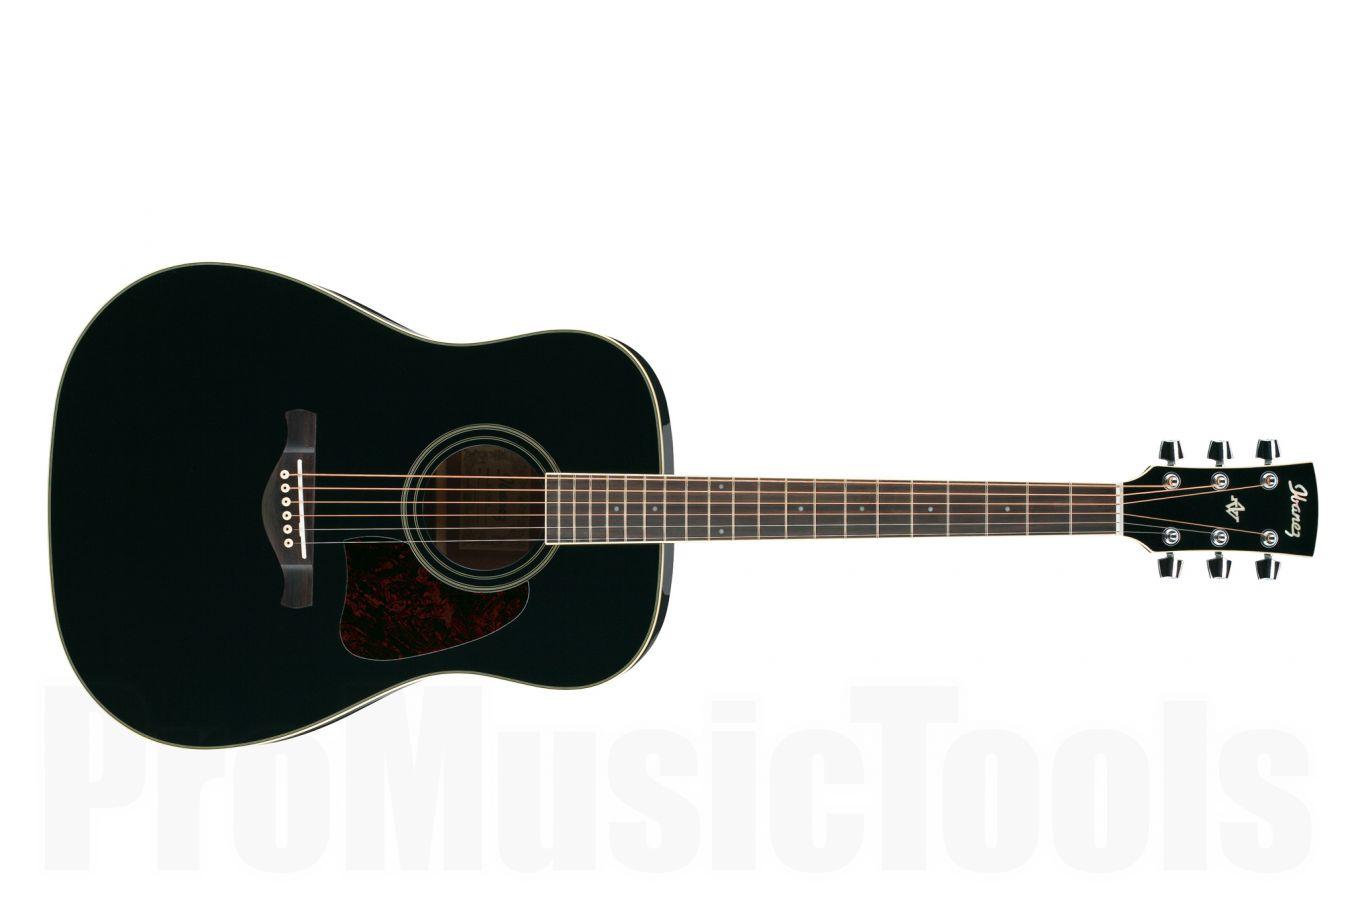 Ibanez AW70 BK - Black